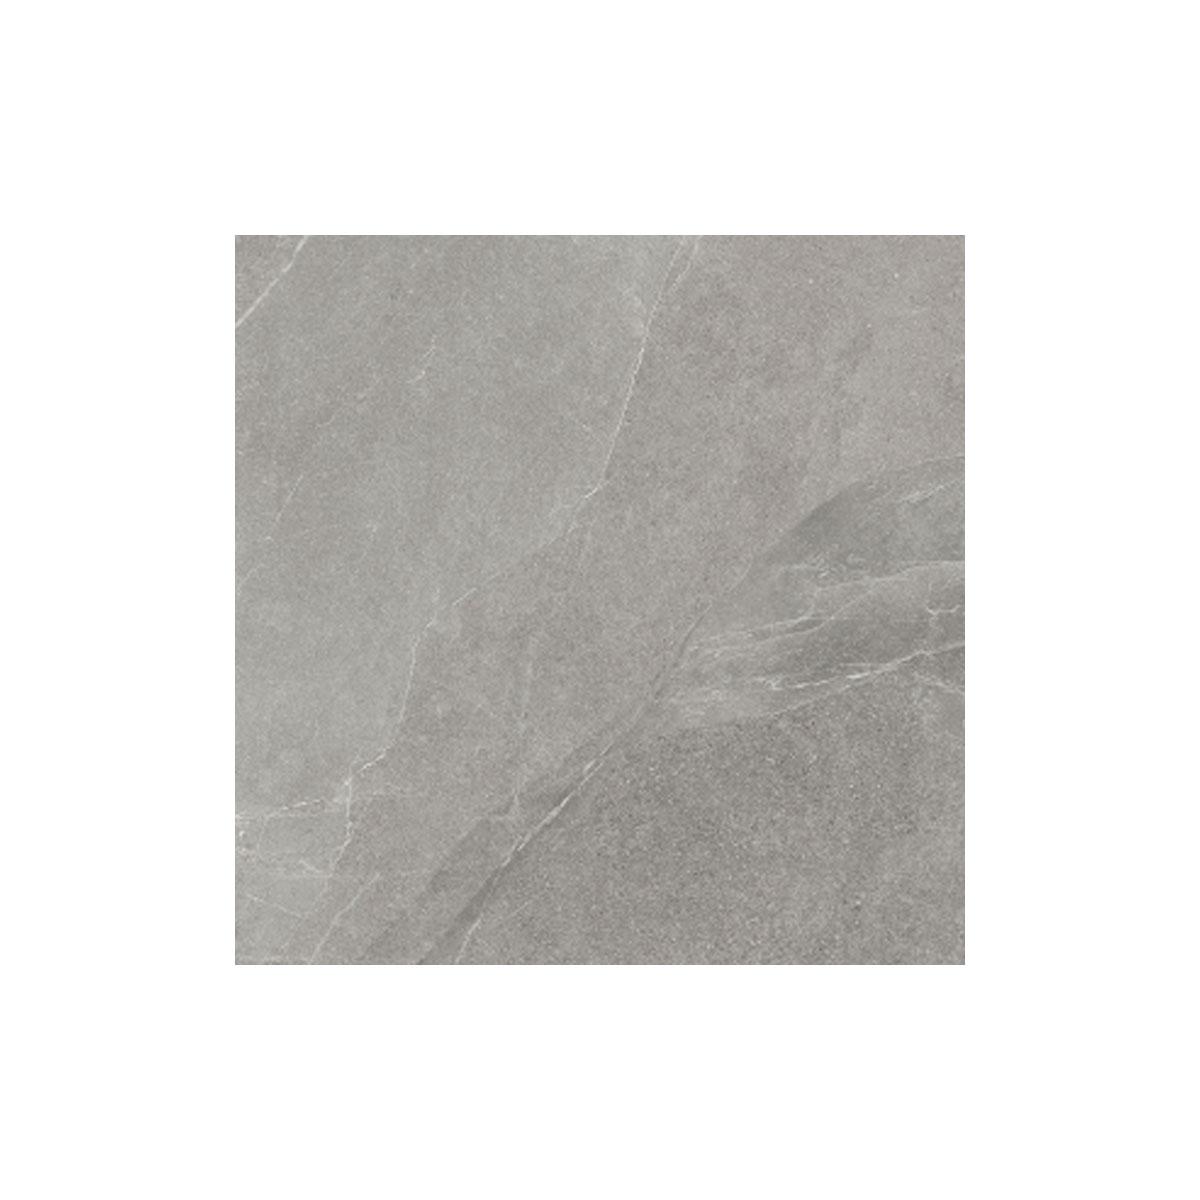 Shale - Greige - Stone Look Tiles - Stone3 Brisbane